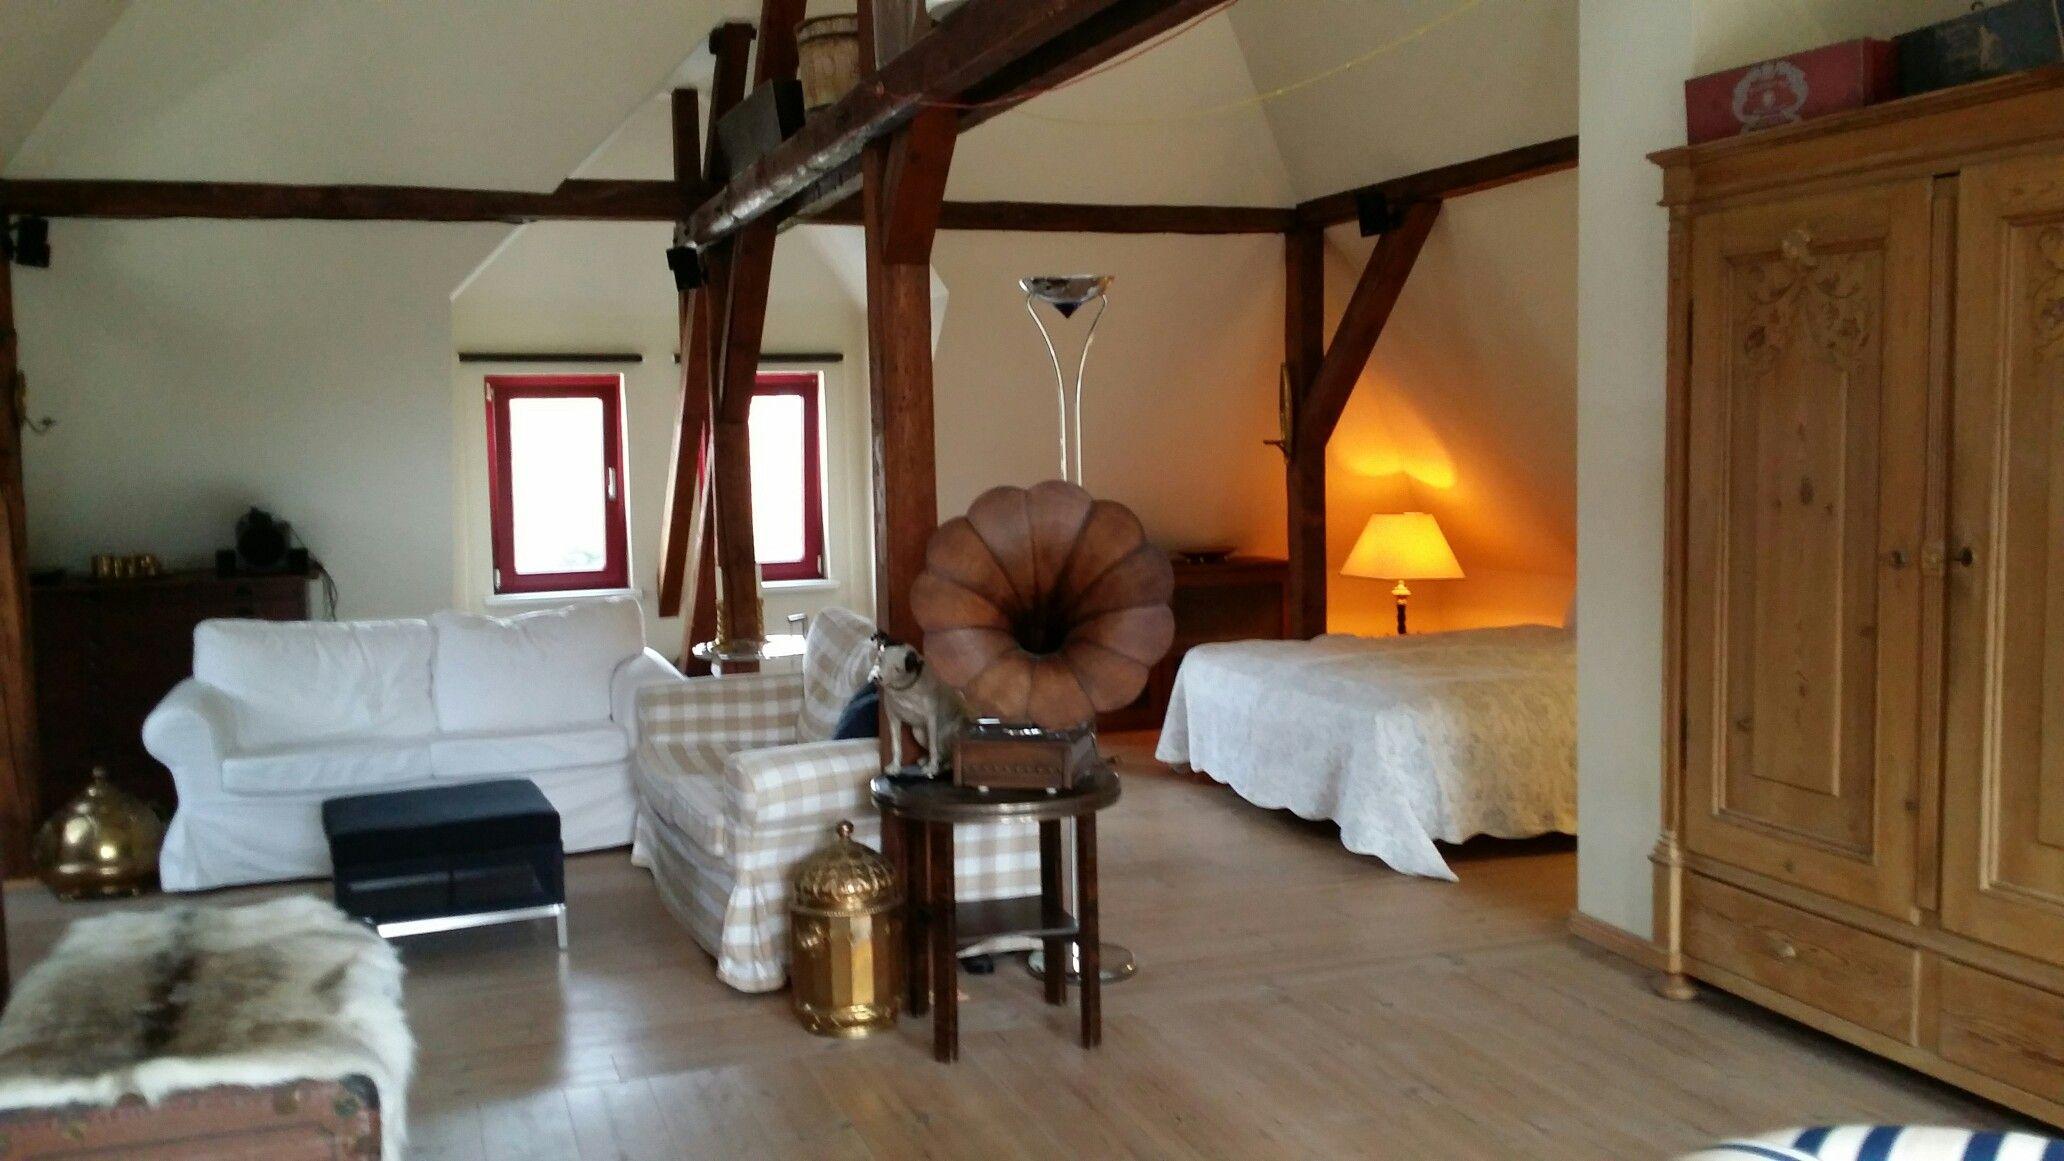 Loft Wohnung Landhausstil Brocante Dresden Pinterest Loft